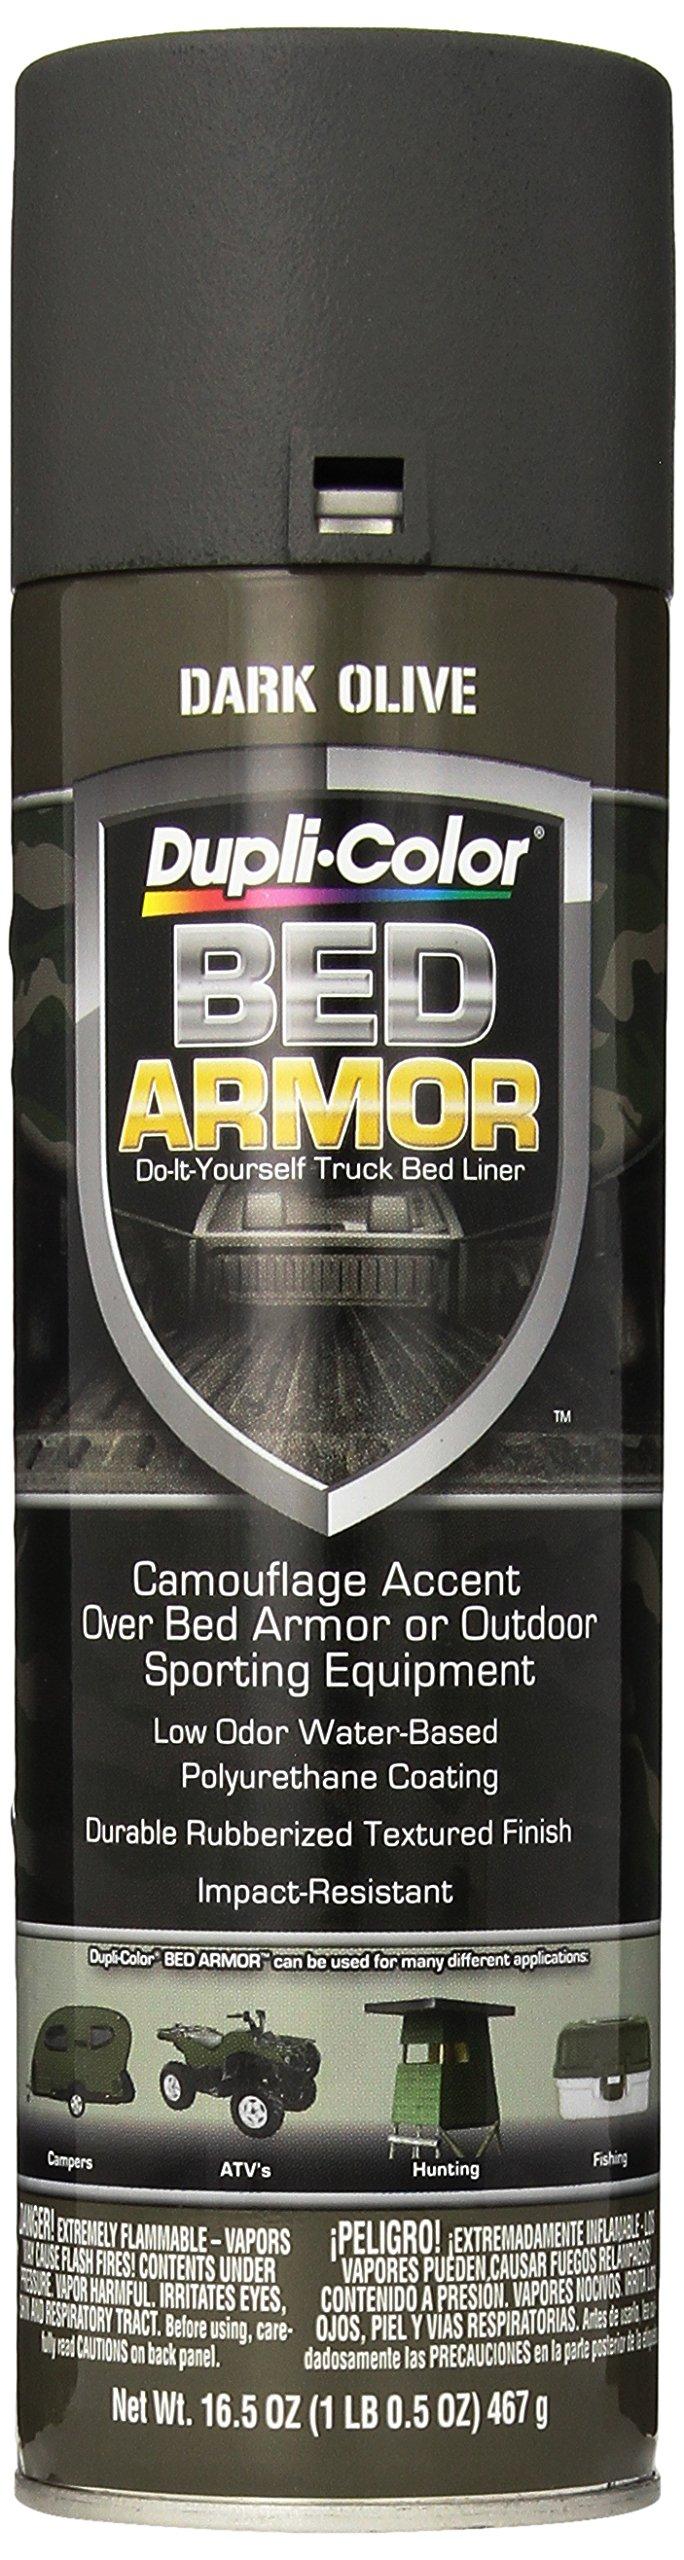 Dupli-Color Black Premium Truck Bed Armor - BAA2020 by Dupli-Color (Image #1)